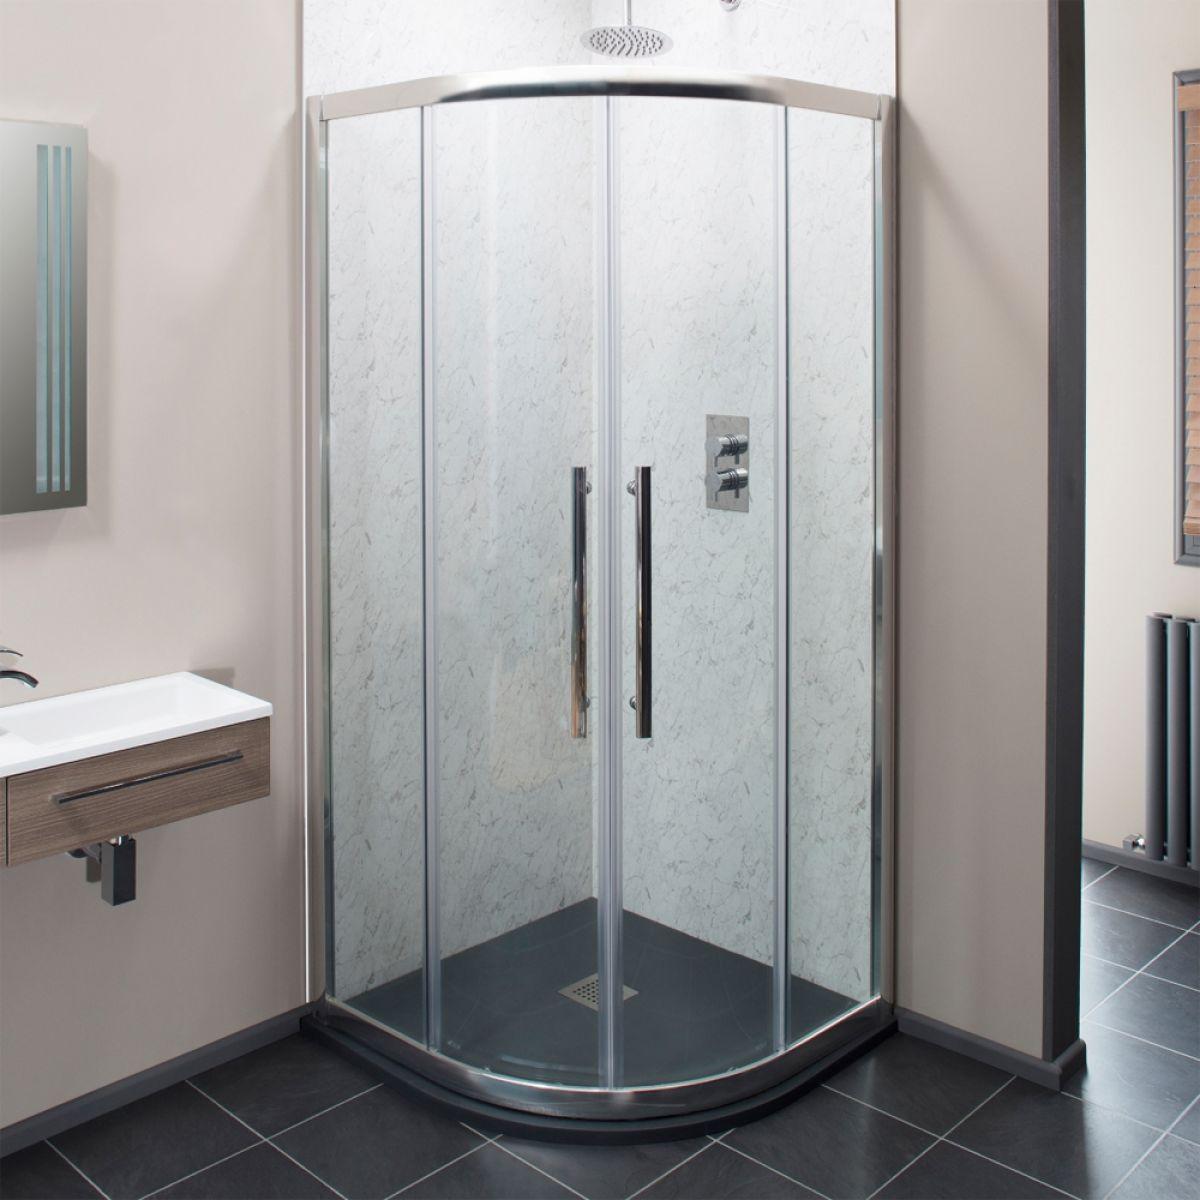 Cassellie Cass Eight Double Door Quadrant Shower Enclosure